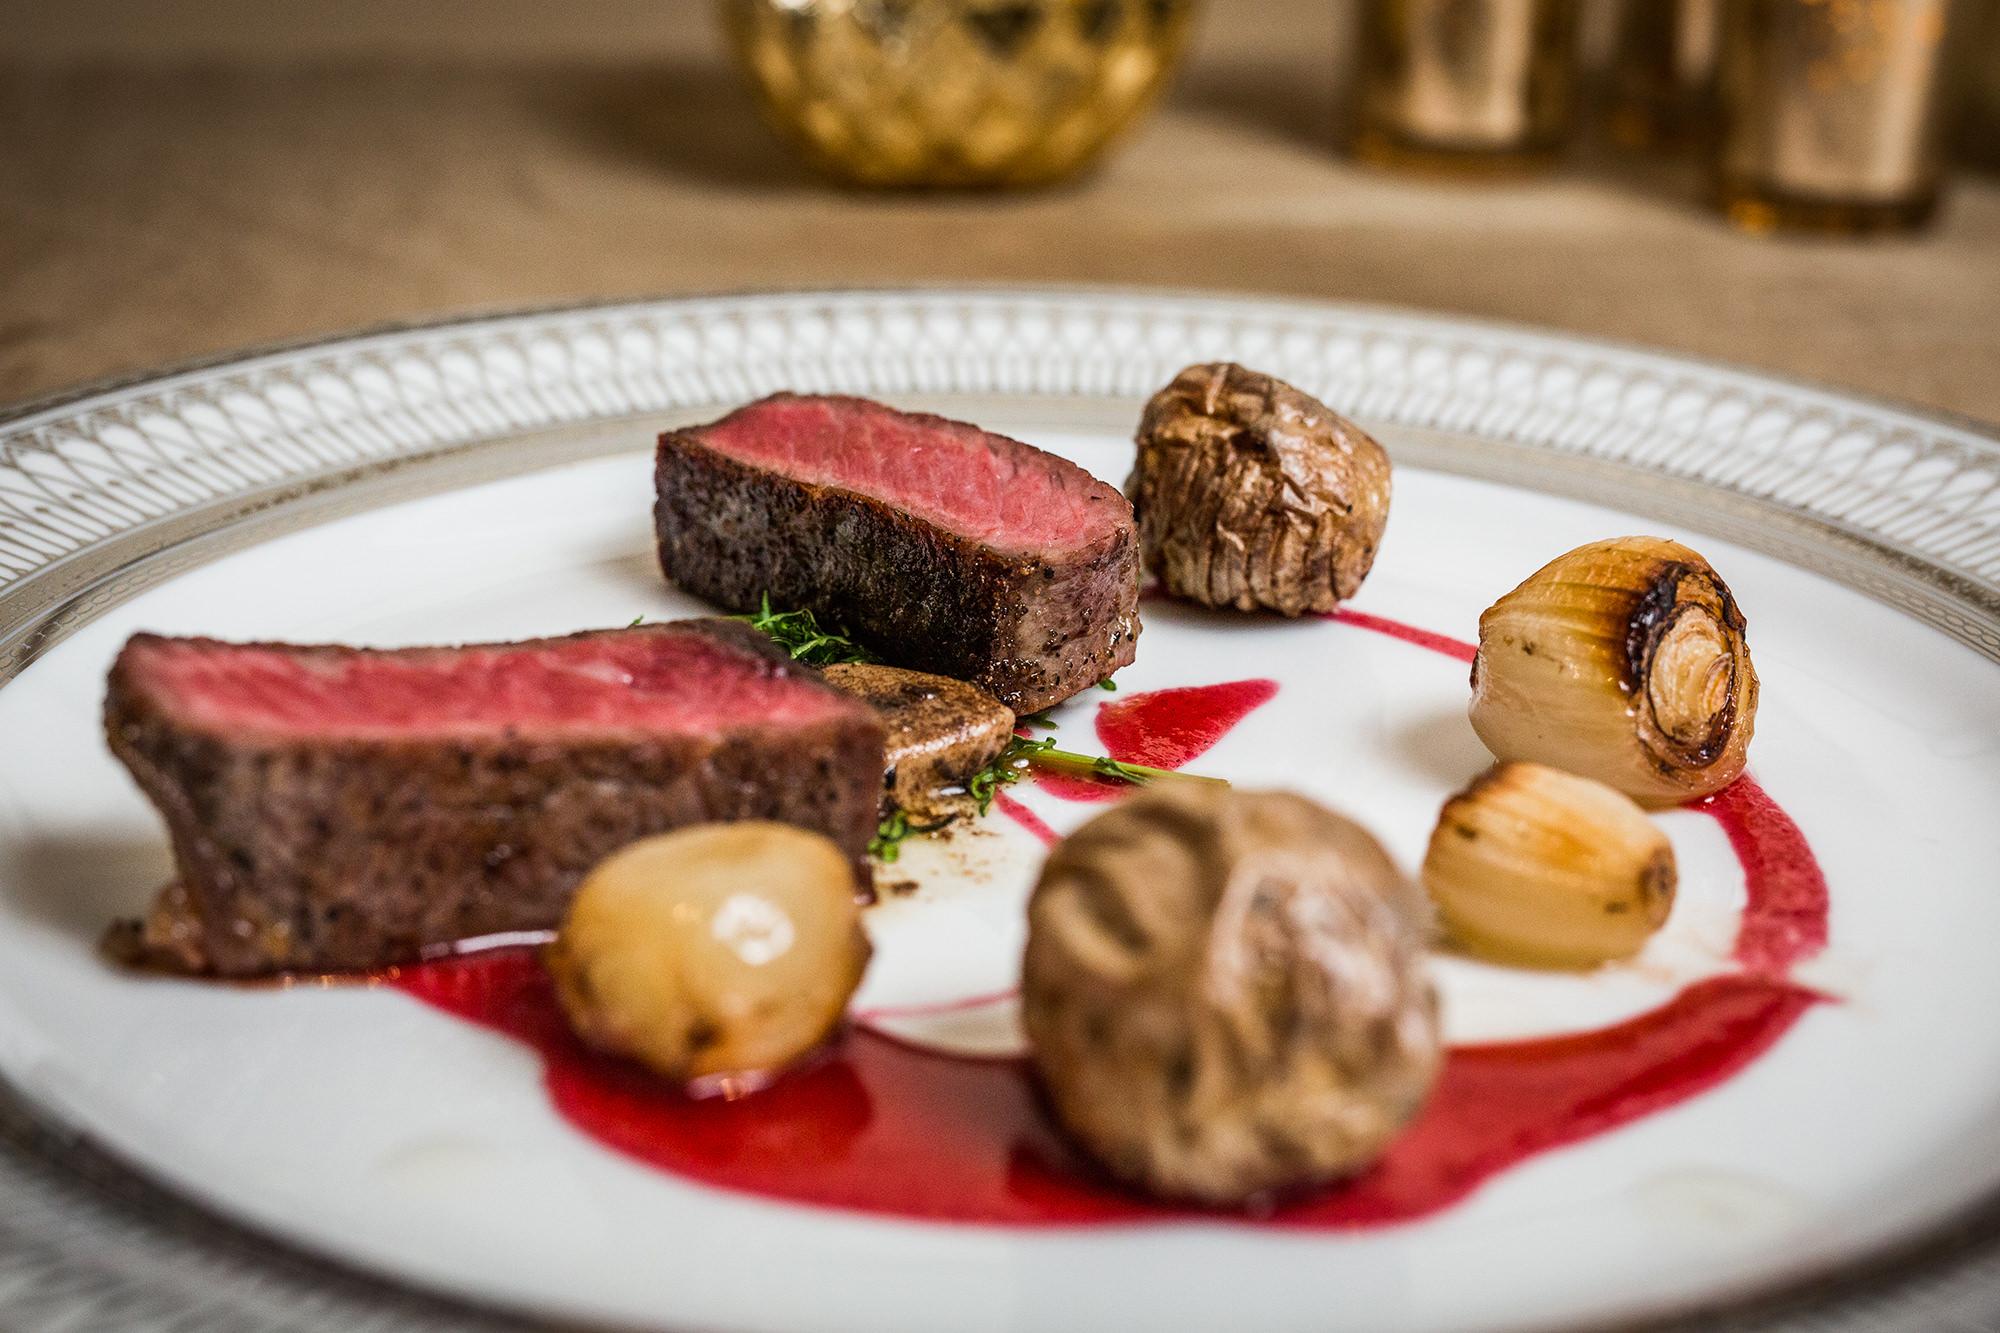 Chef Dinner - Steak